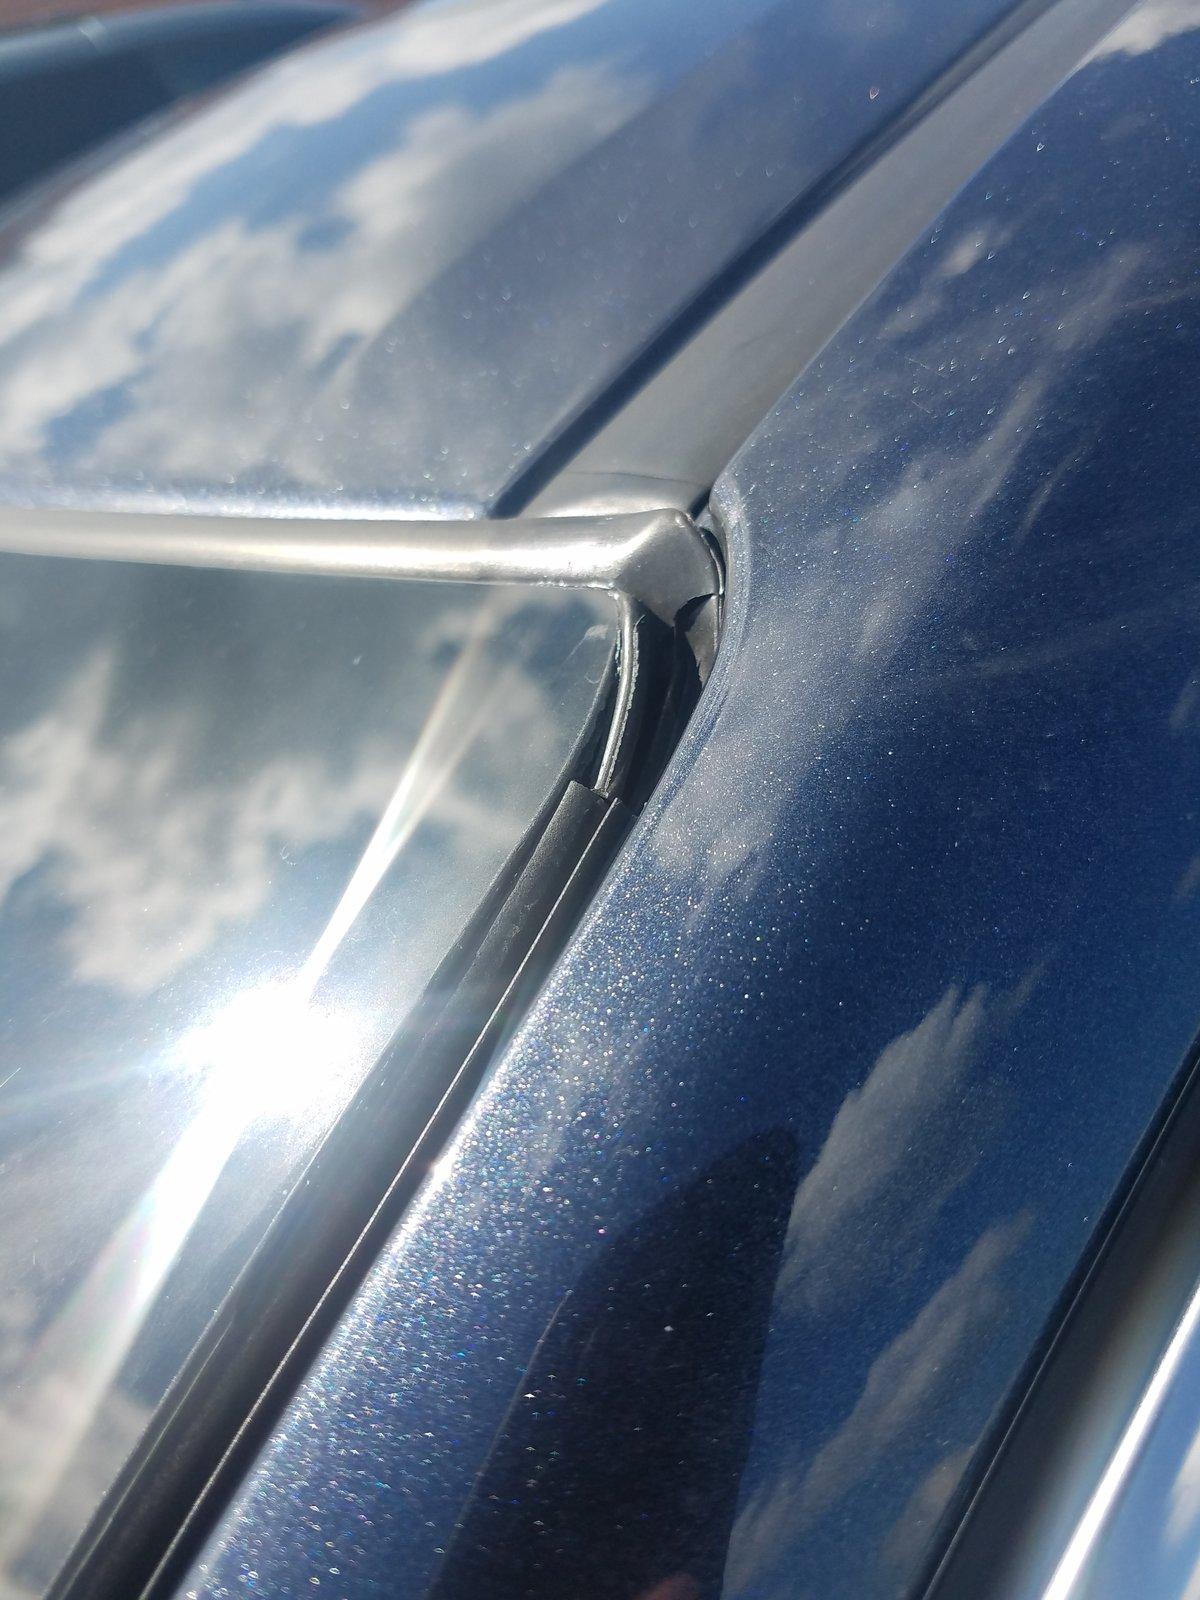 2010 Honda Civic Windshield Trim : honda, civic, windshield, Safelite, Windshield, Replacement, Cosmetic, Issue?, 2016+, Honda, Civic, Forum, (10th, Forum,, CivicX.com